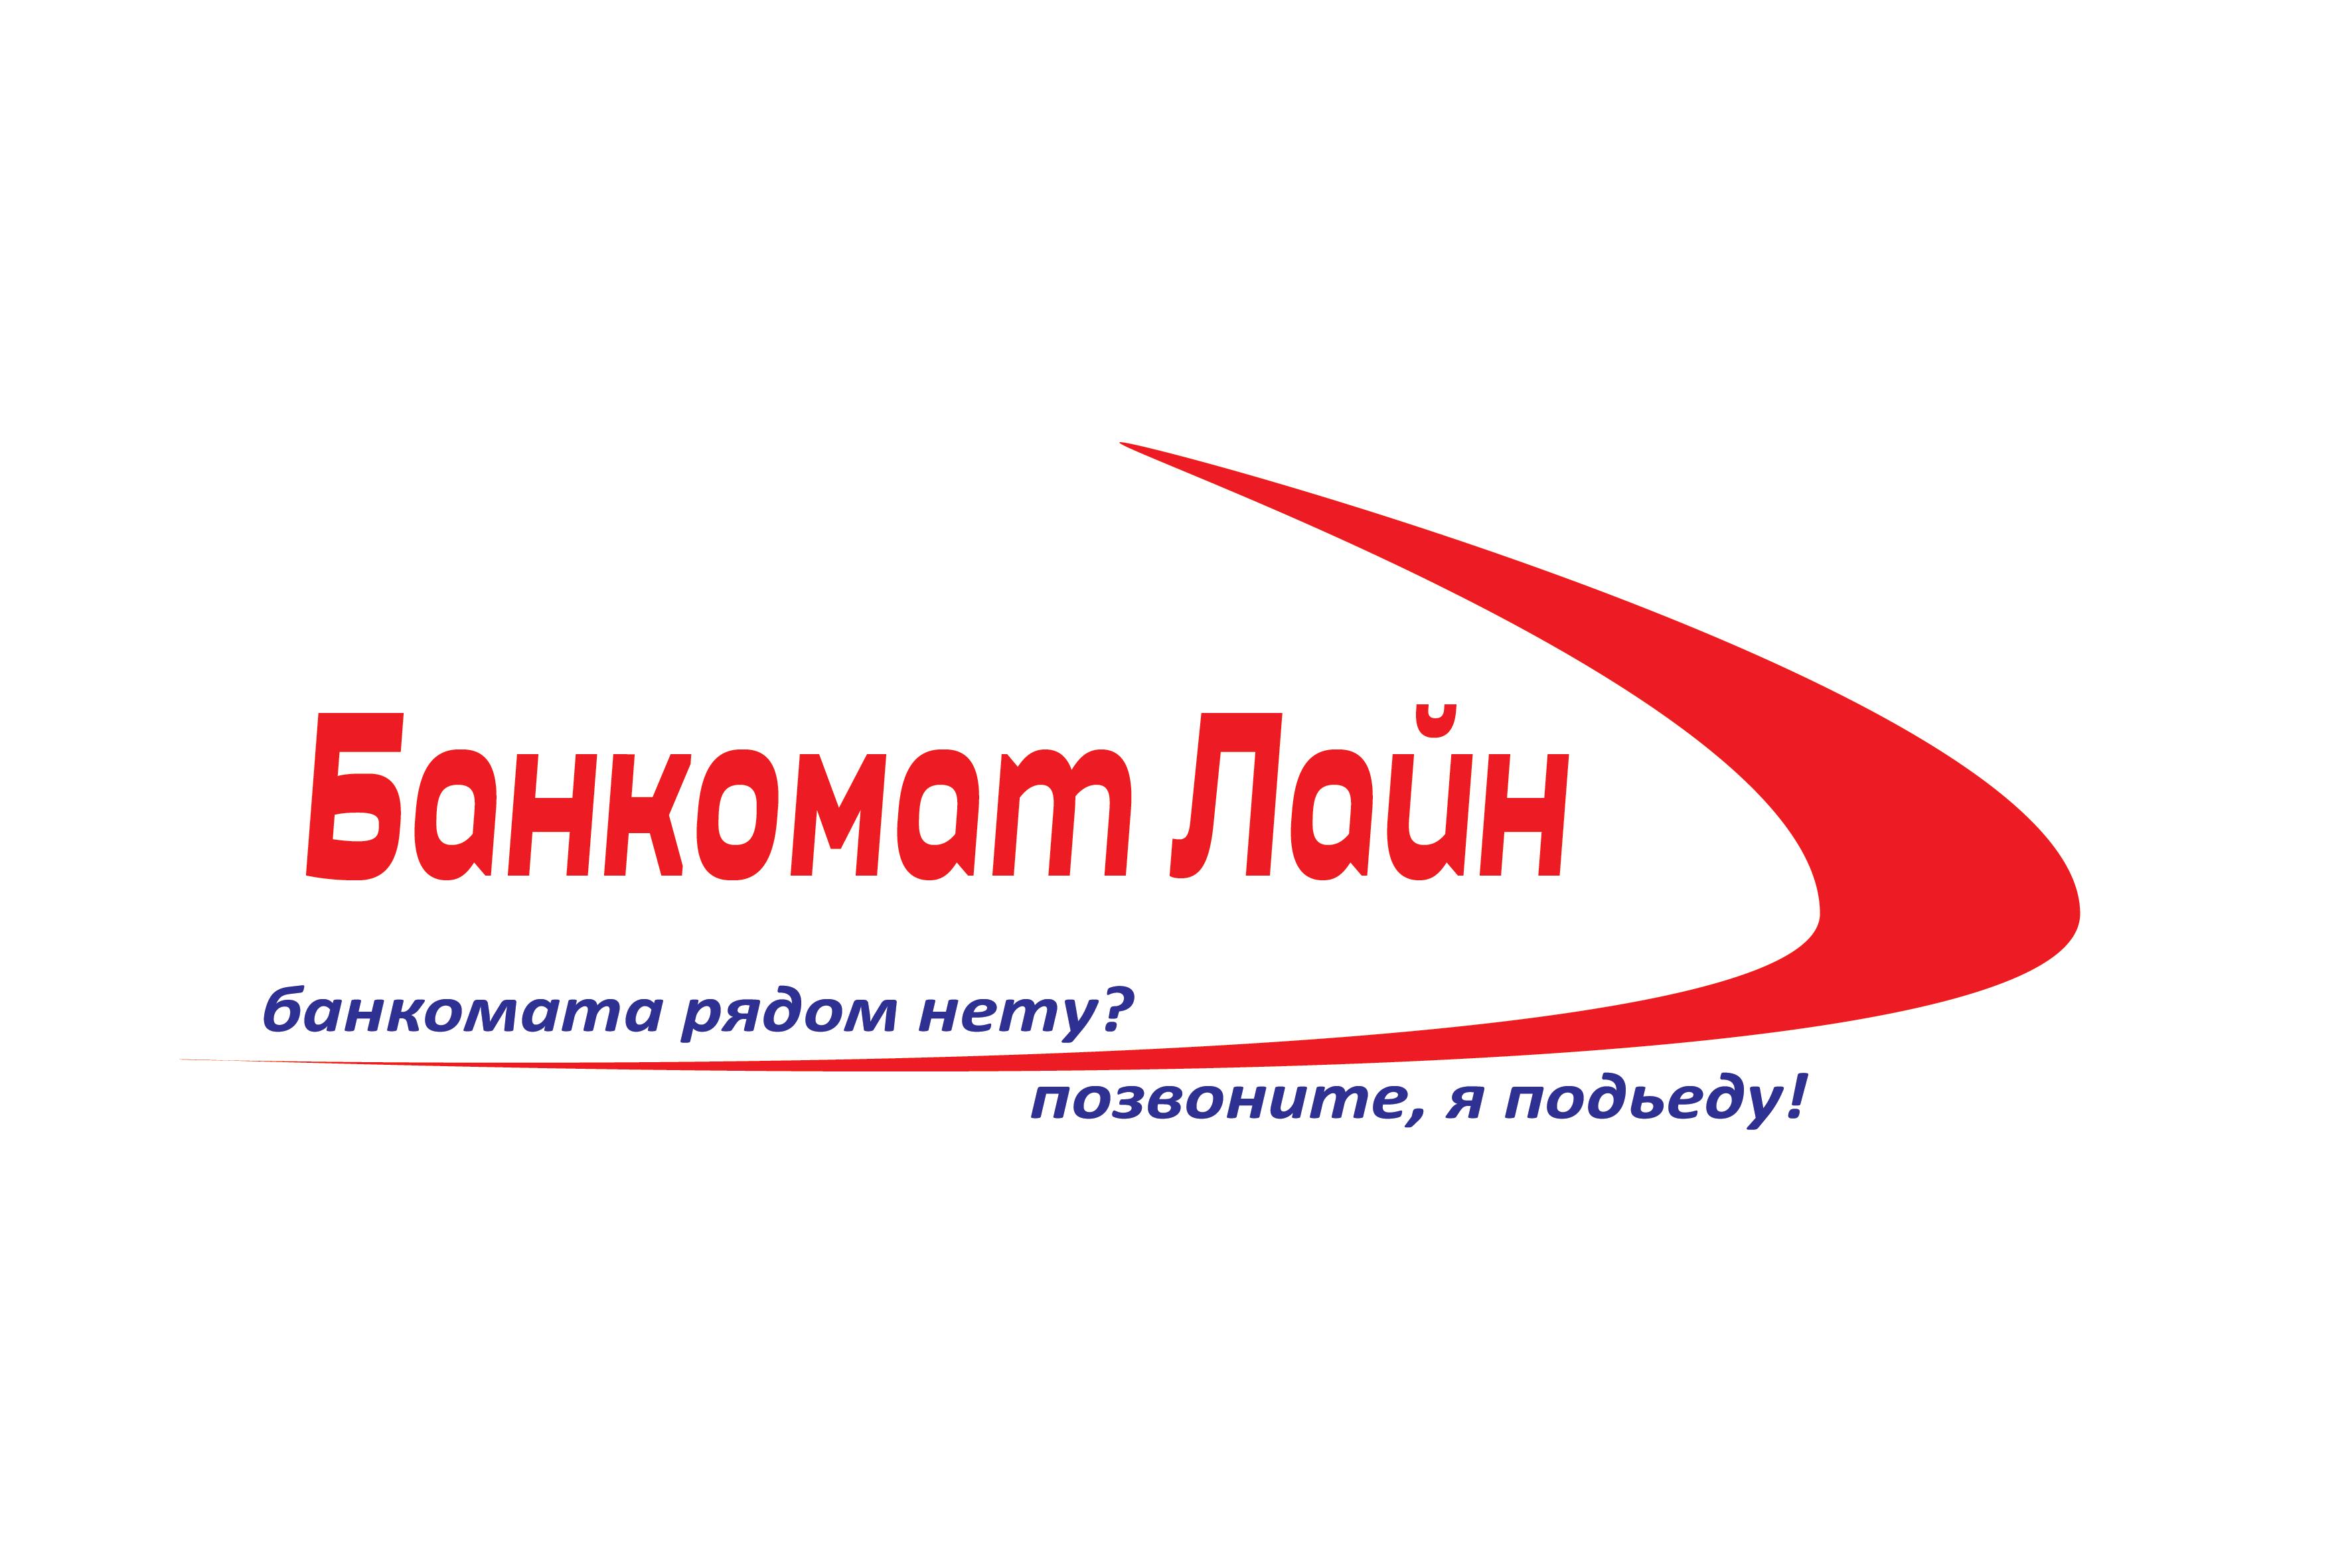 Разработка логотипа и слогана для транспортной компании фото f_8075878acb5b3b6f.png